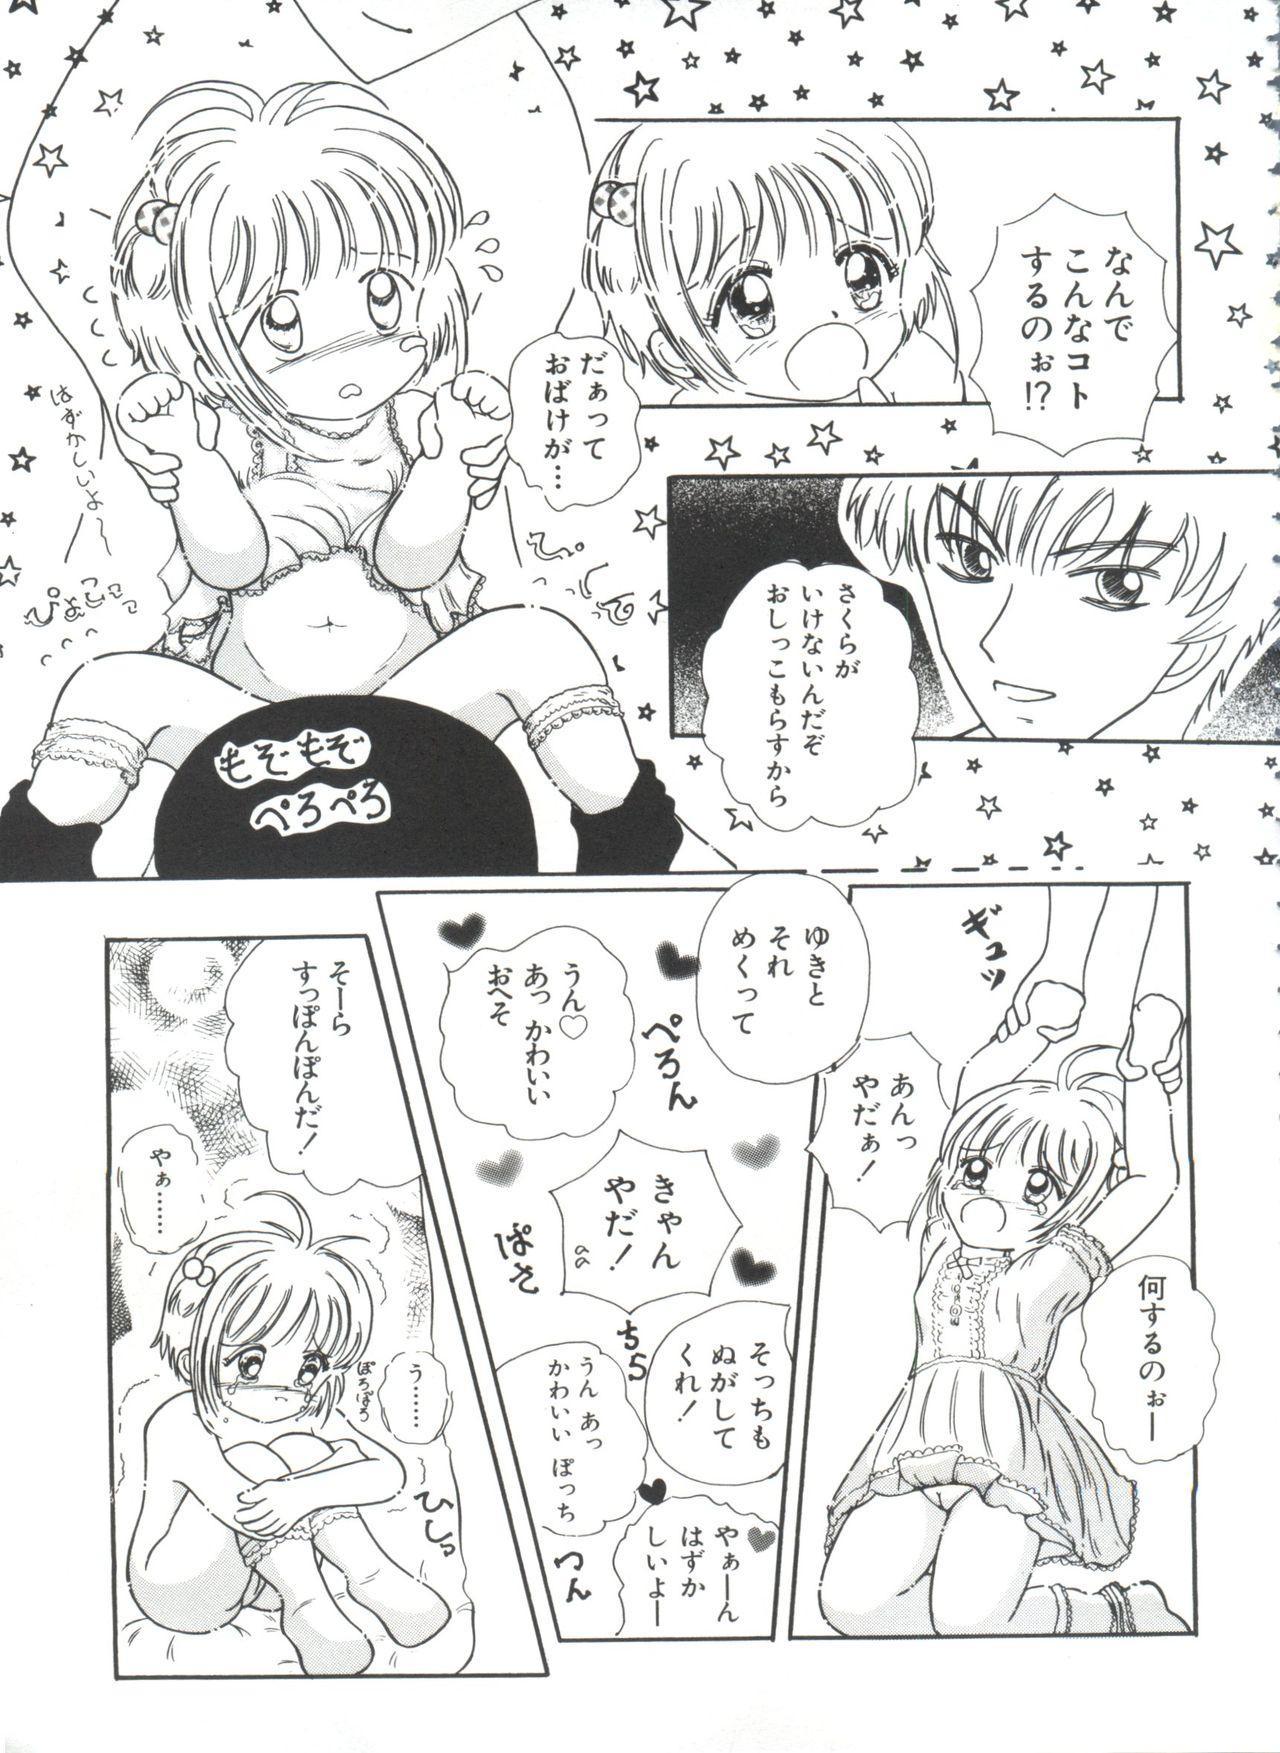 Ero-chan to Issho 3 64